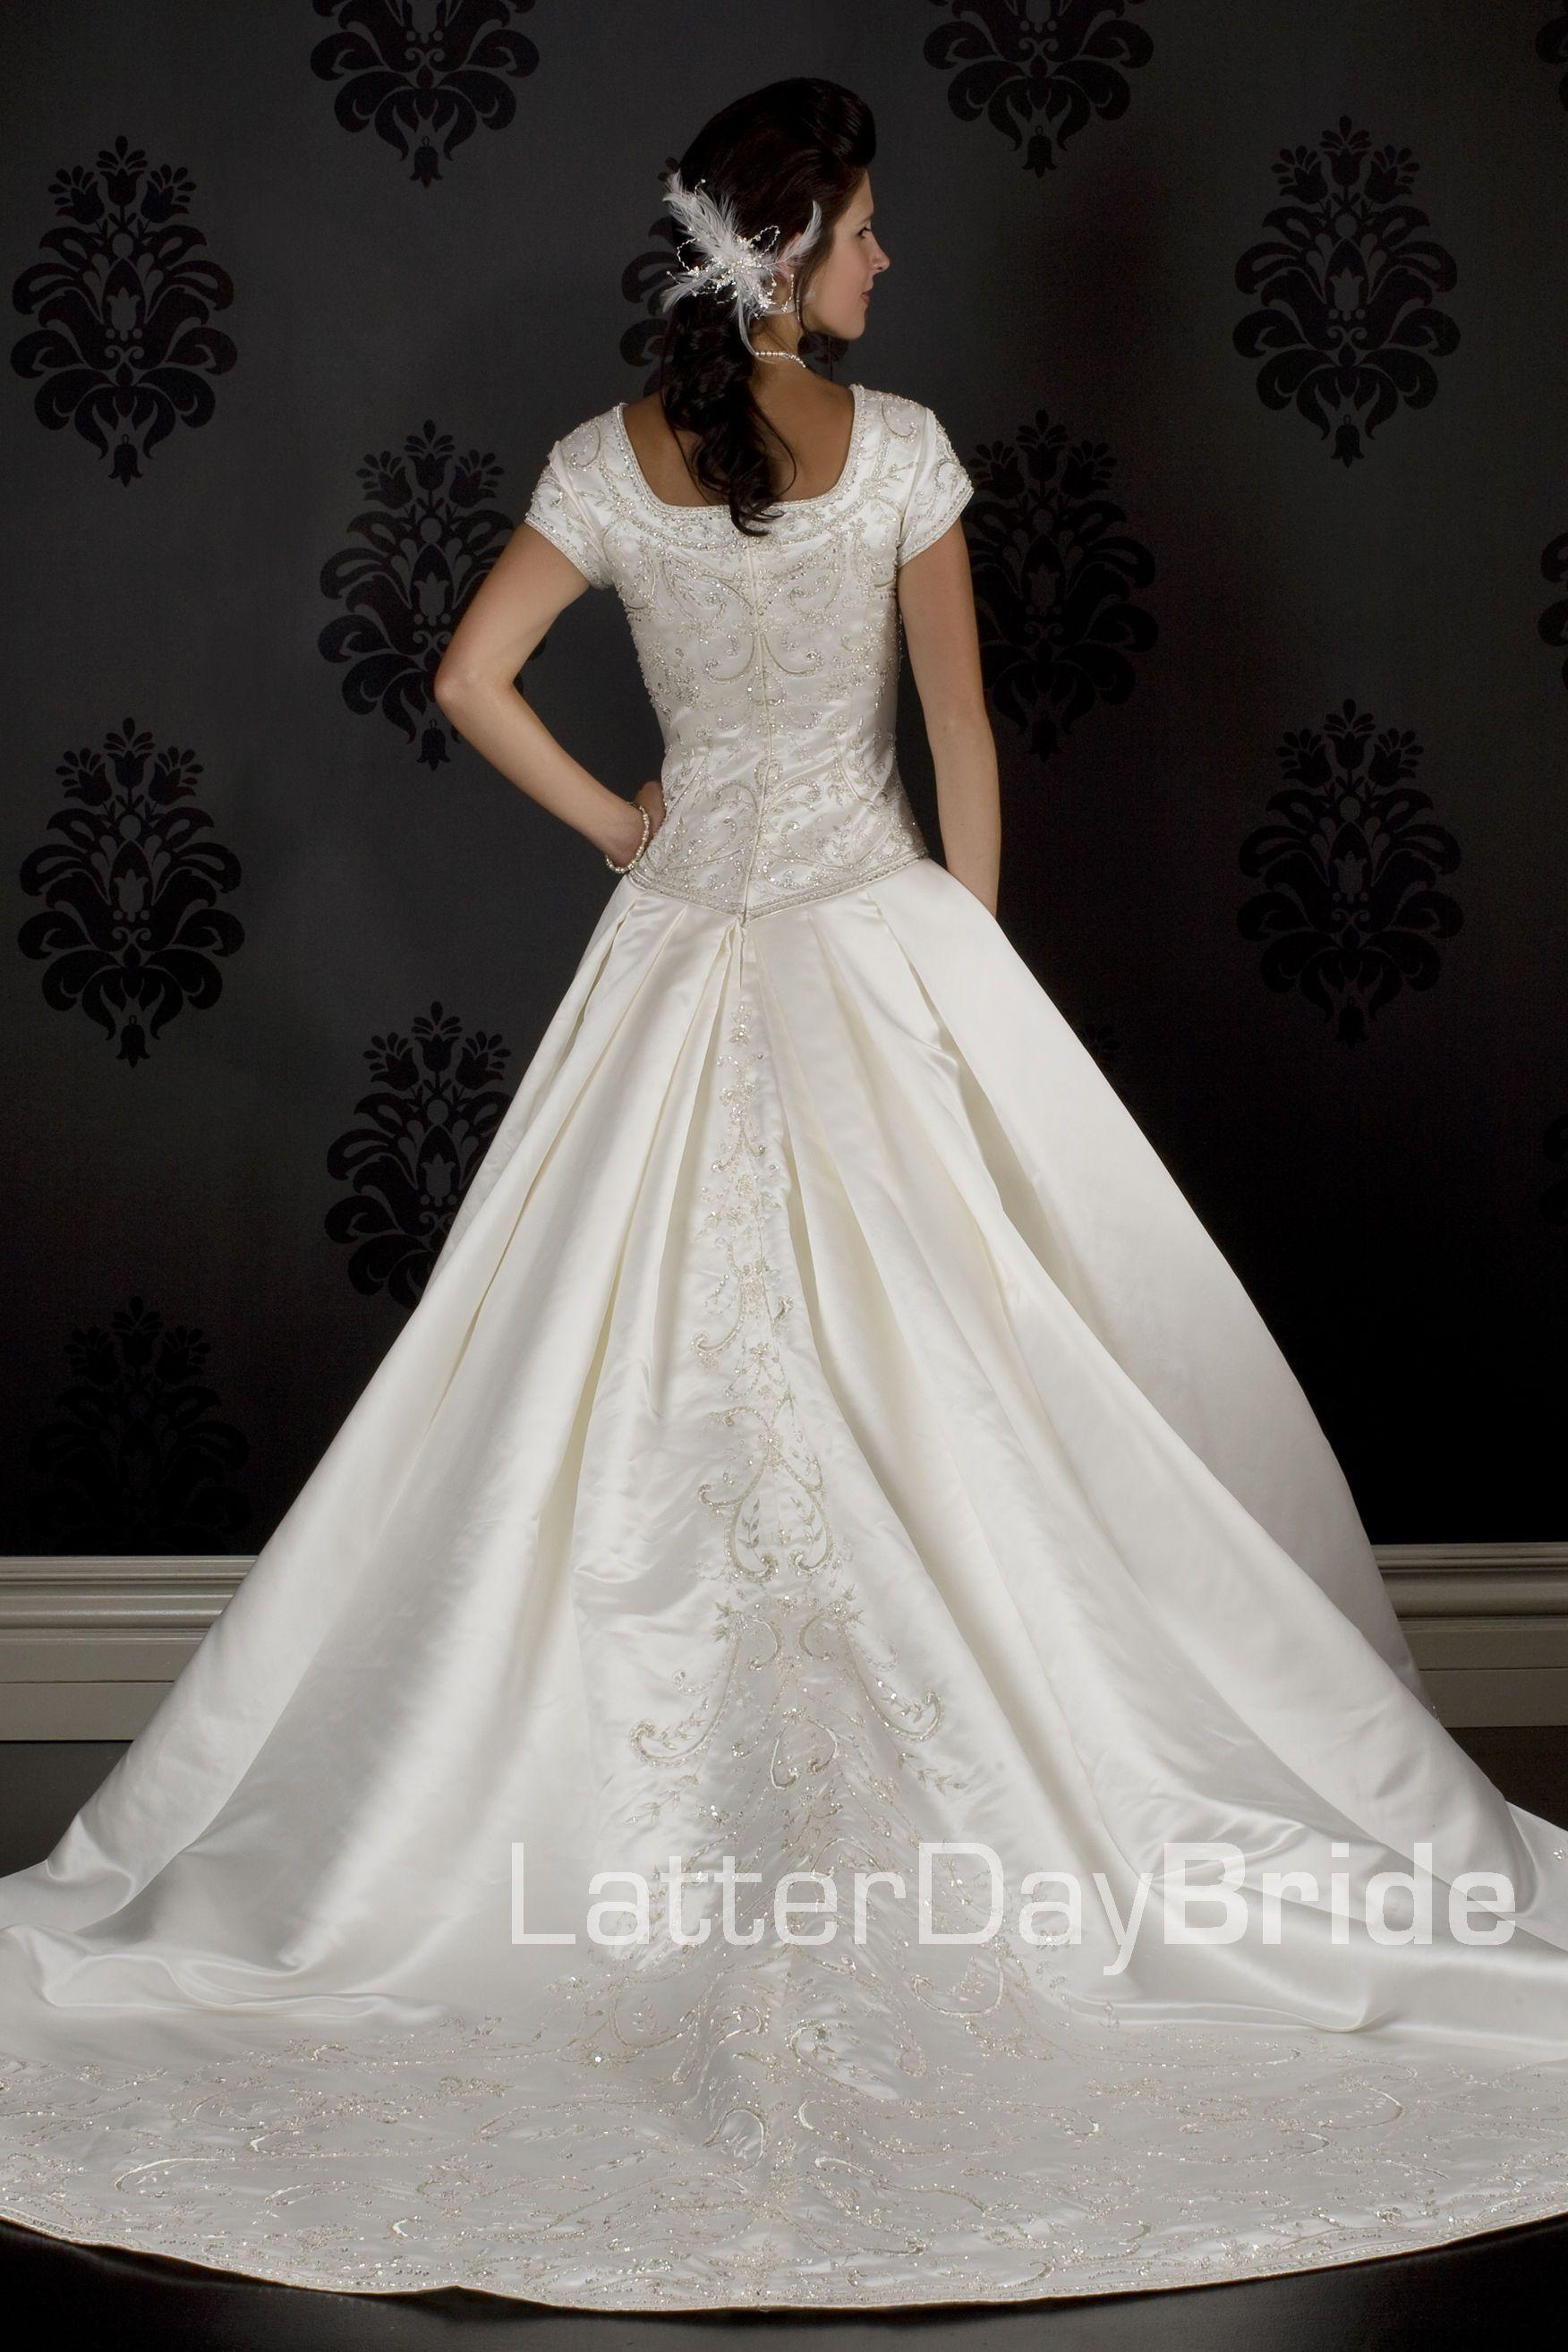 Modest Wedding Dress, Merlino LatterDayBride & Prom